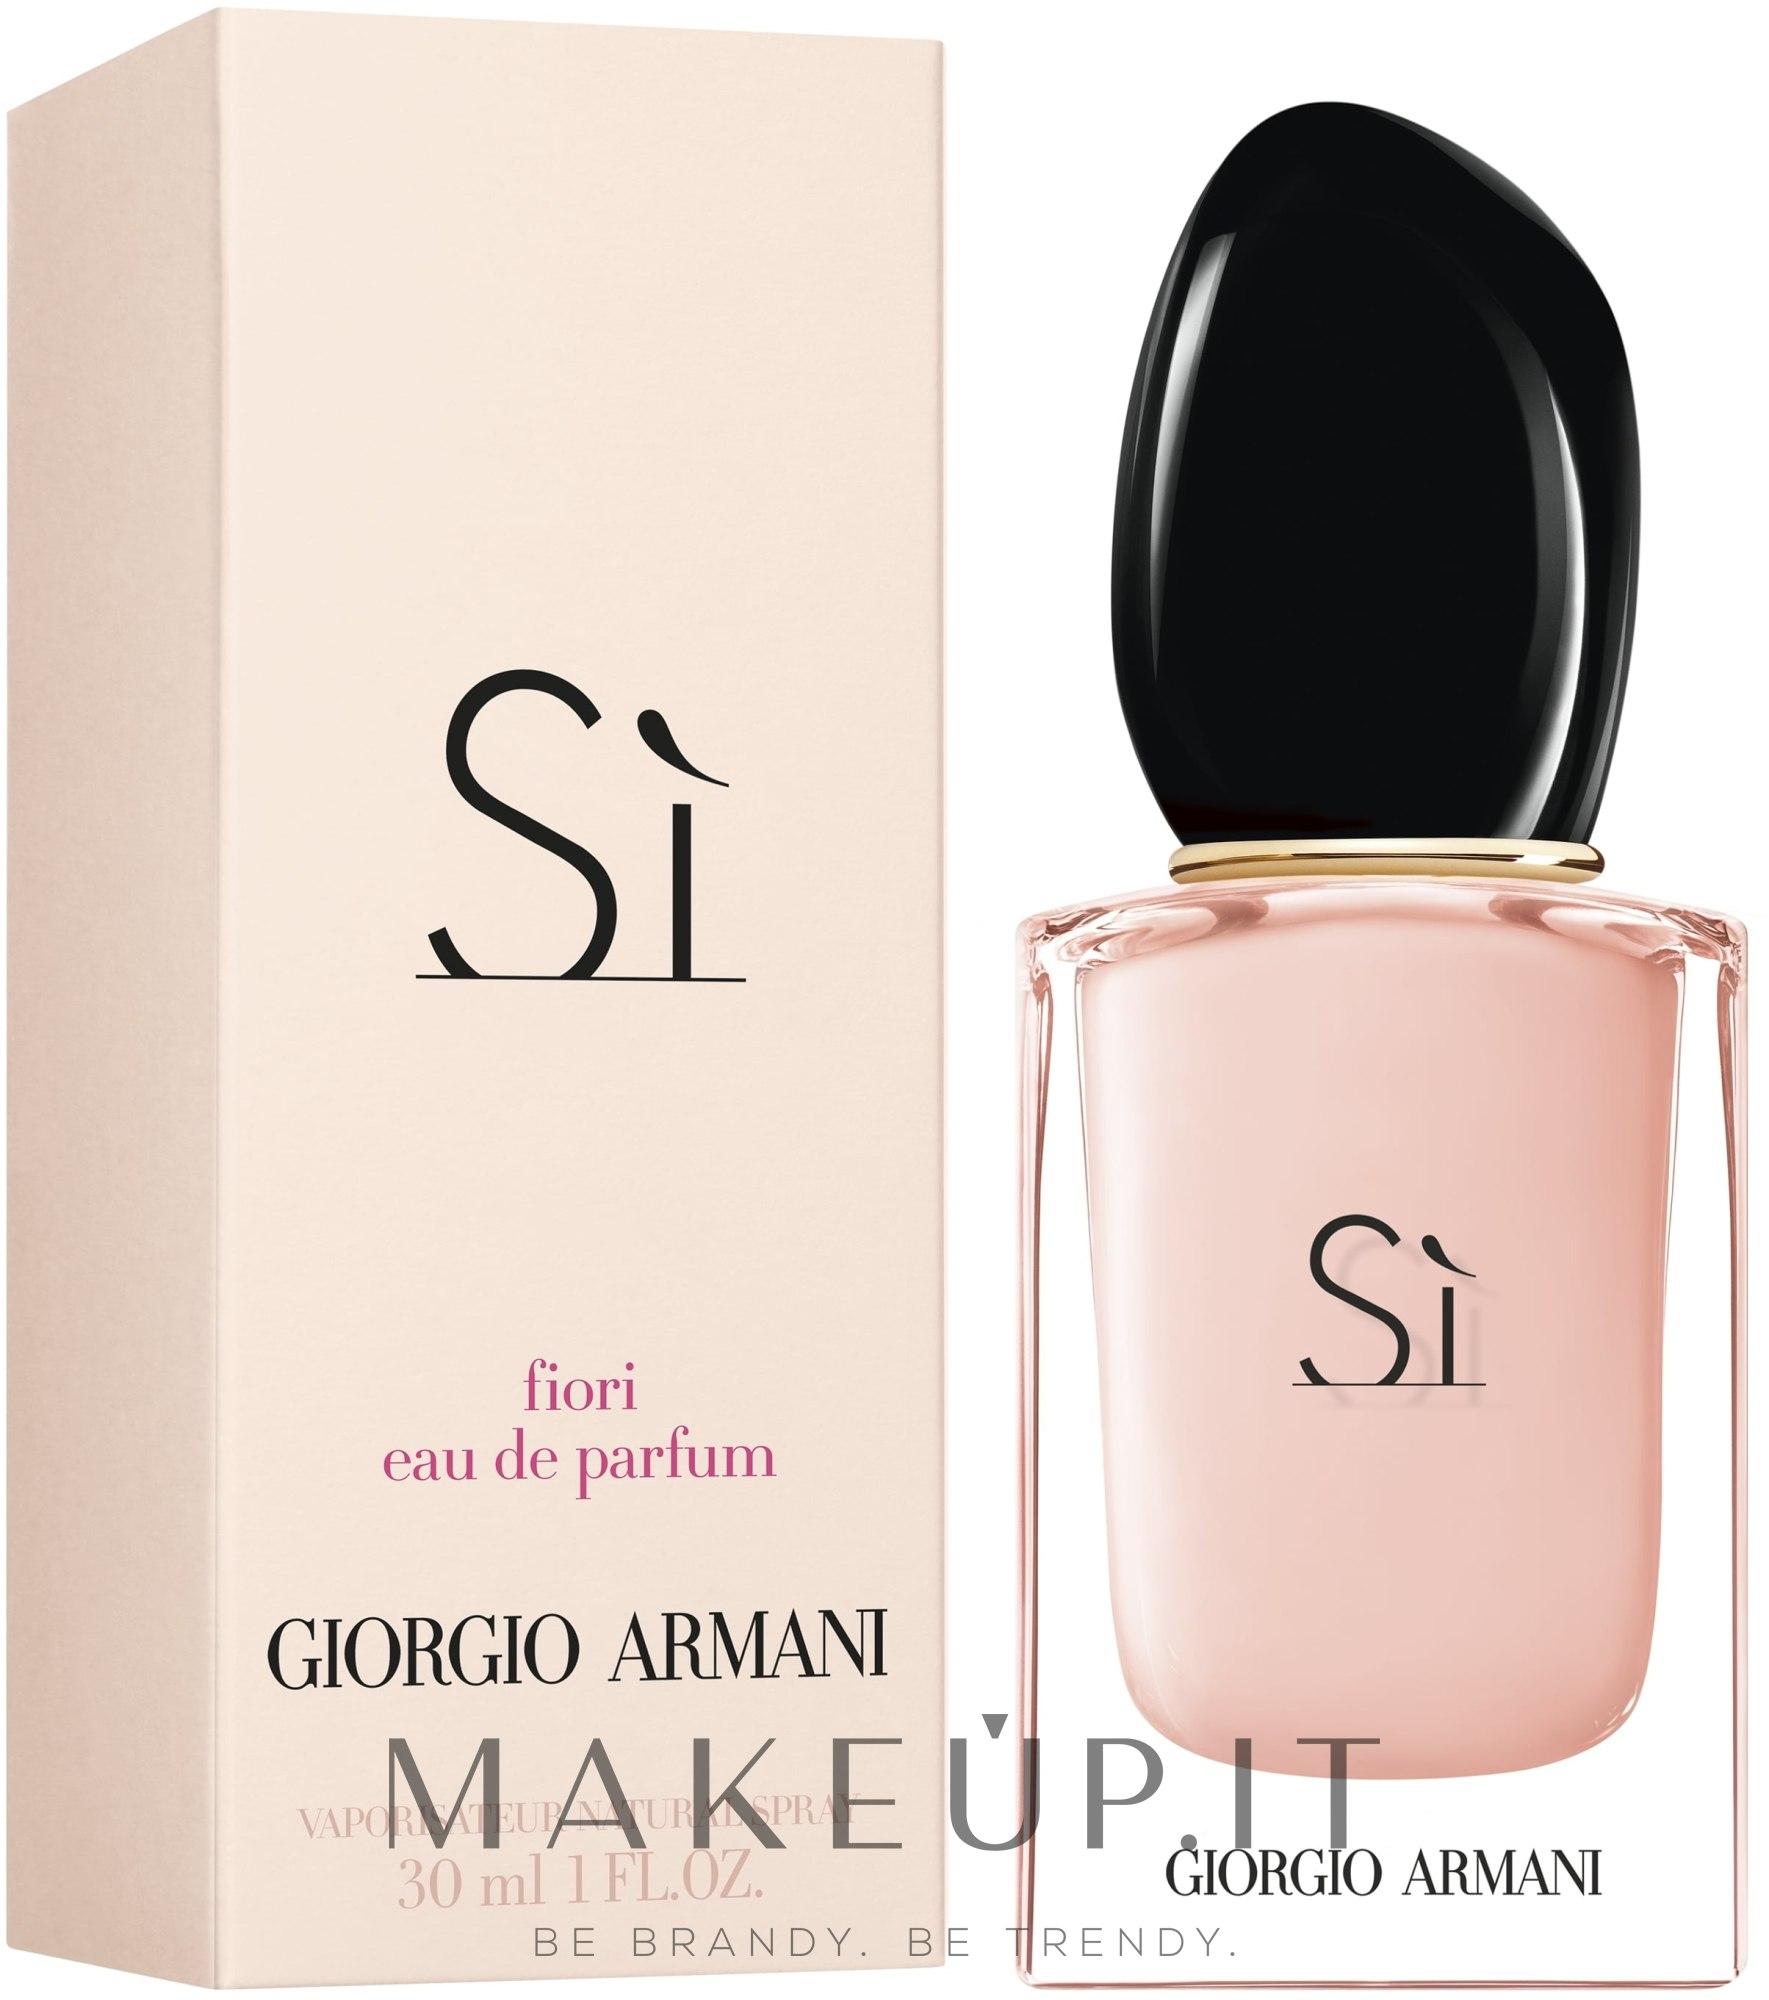 Giorgio Armani Si Fiori - Eau de Parfum — foto 30 ml